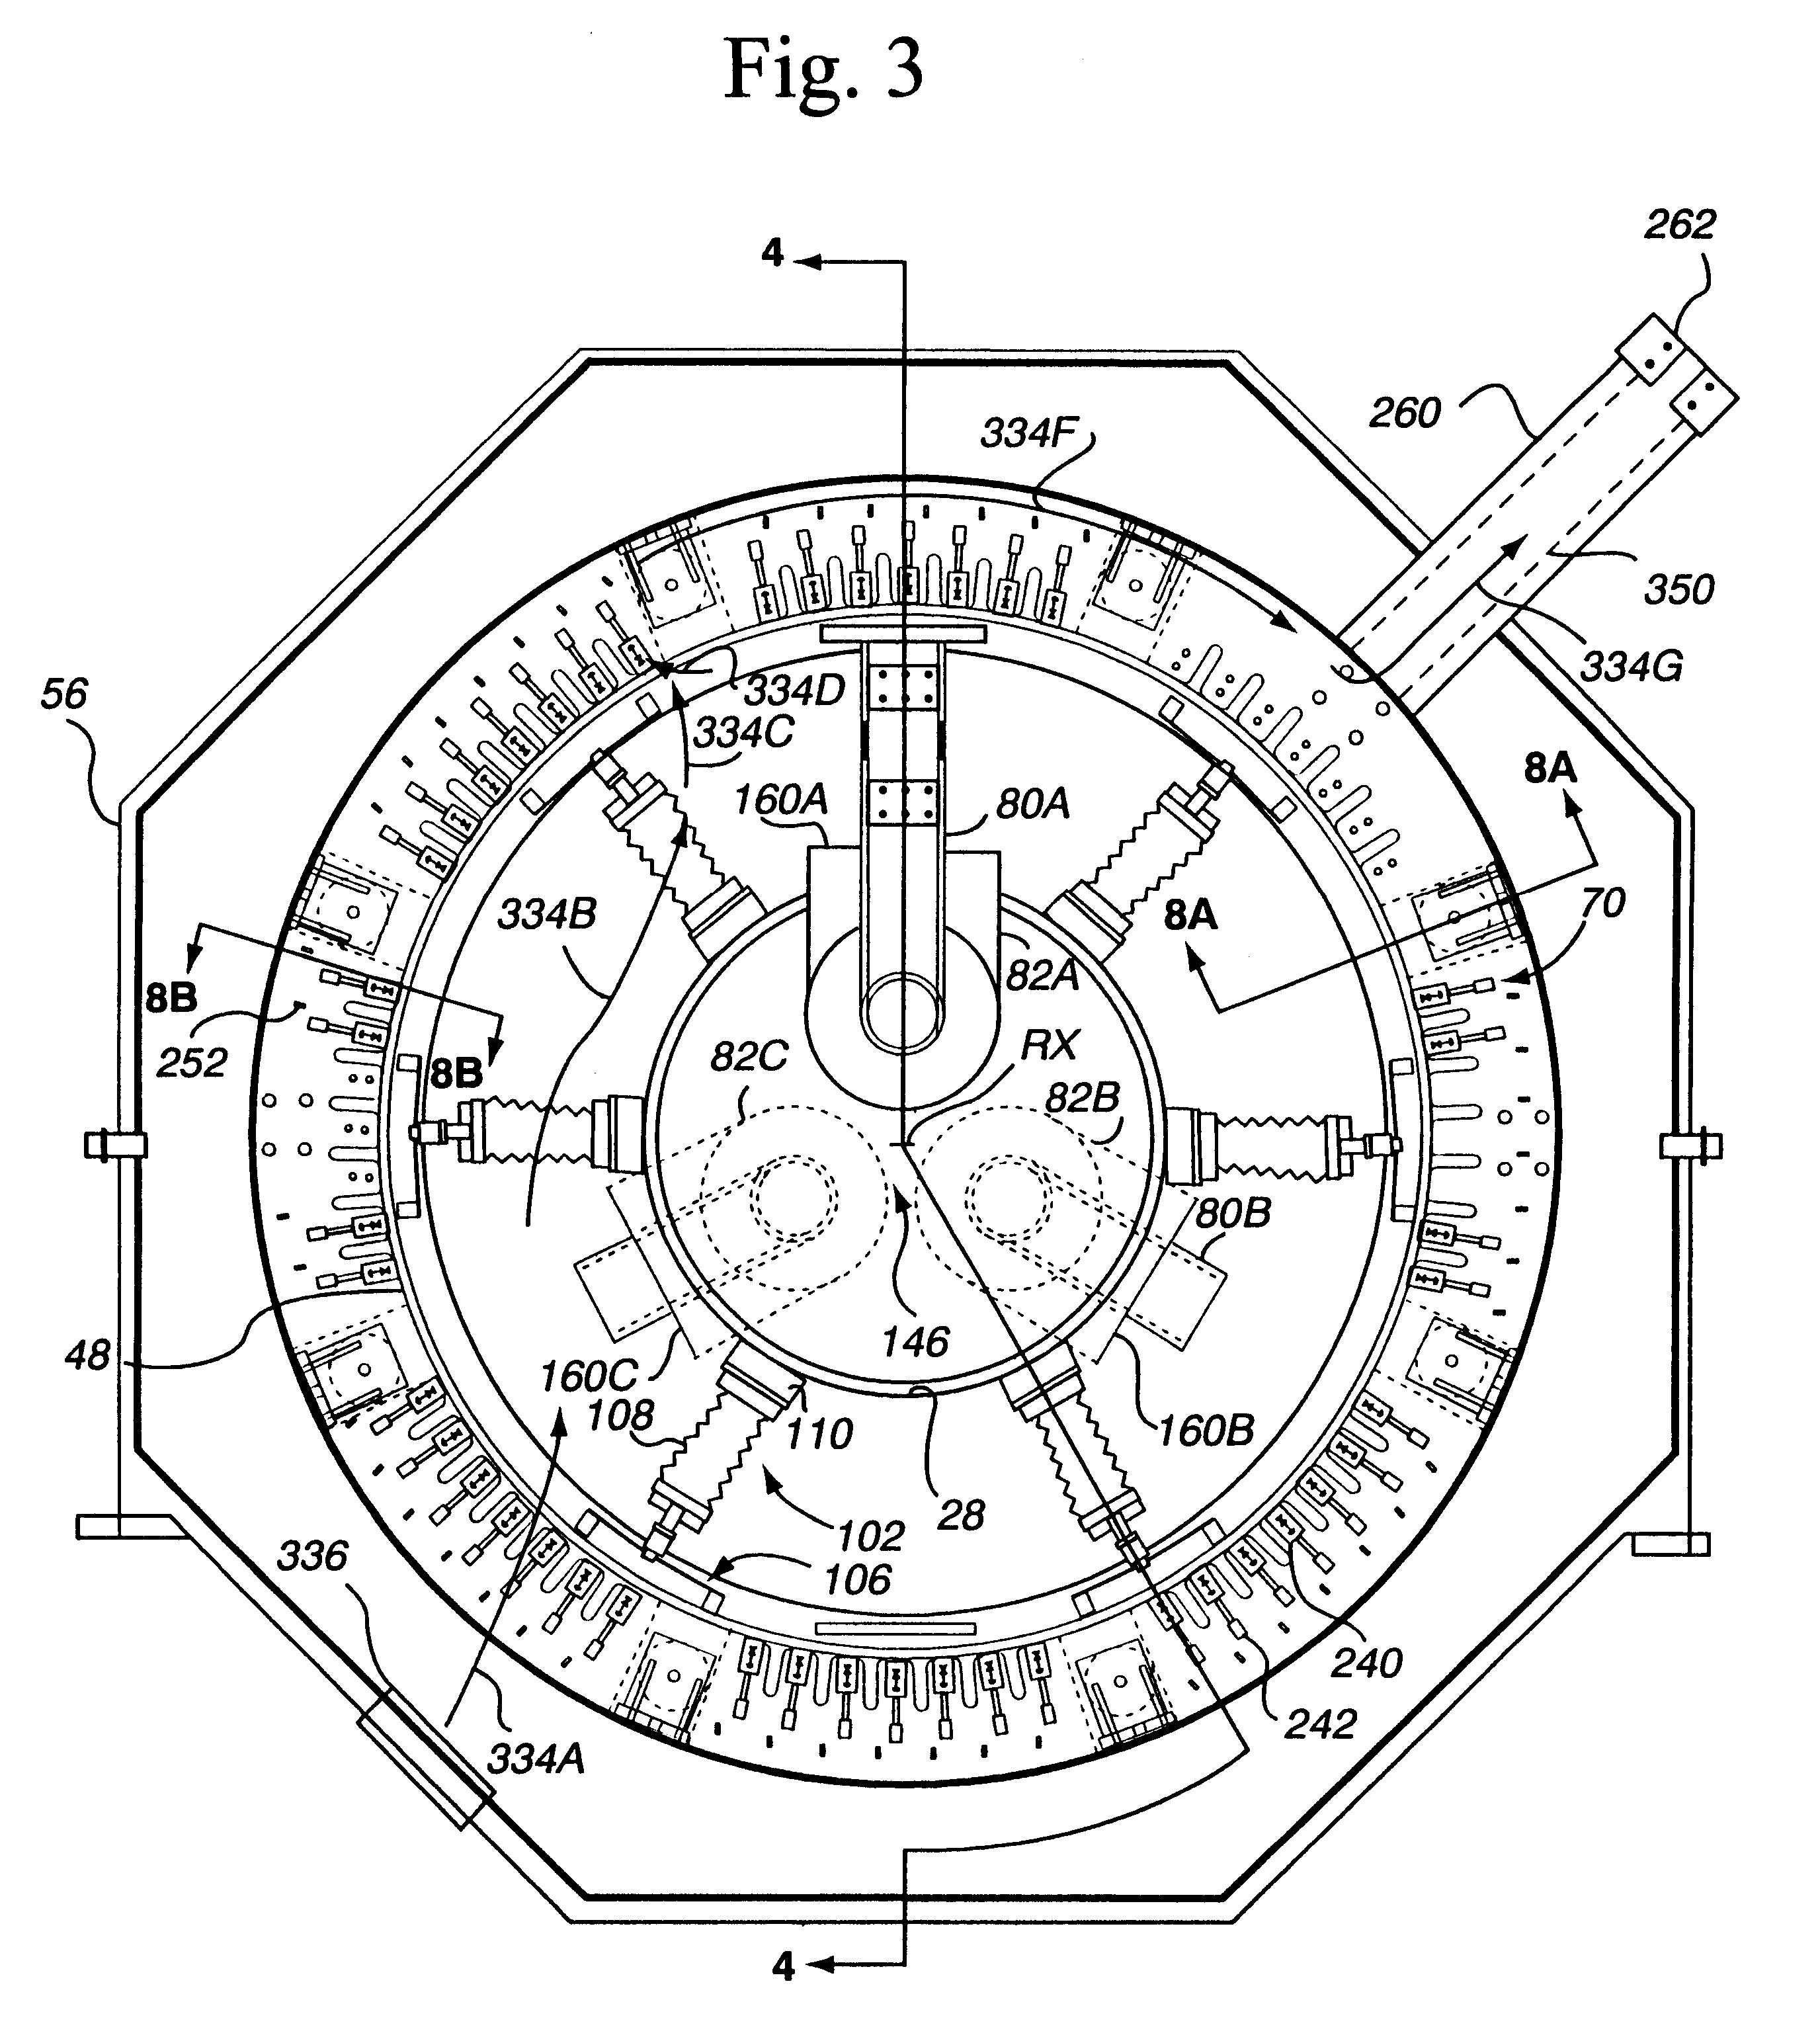 5e Rj 45 Wiring Diagram Free Download Wiring Diagram Schematic